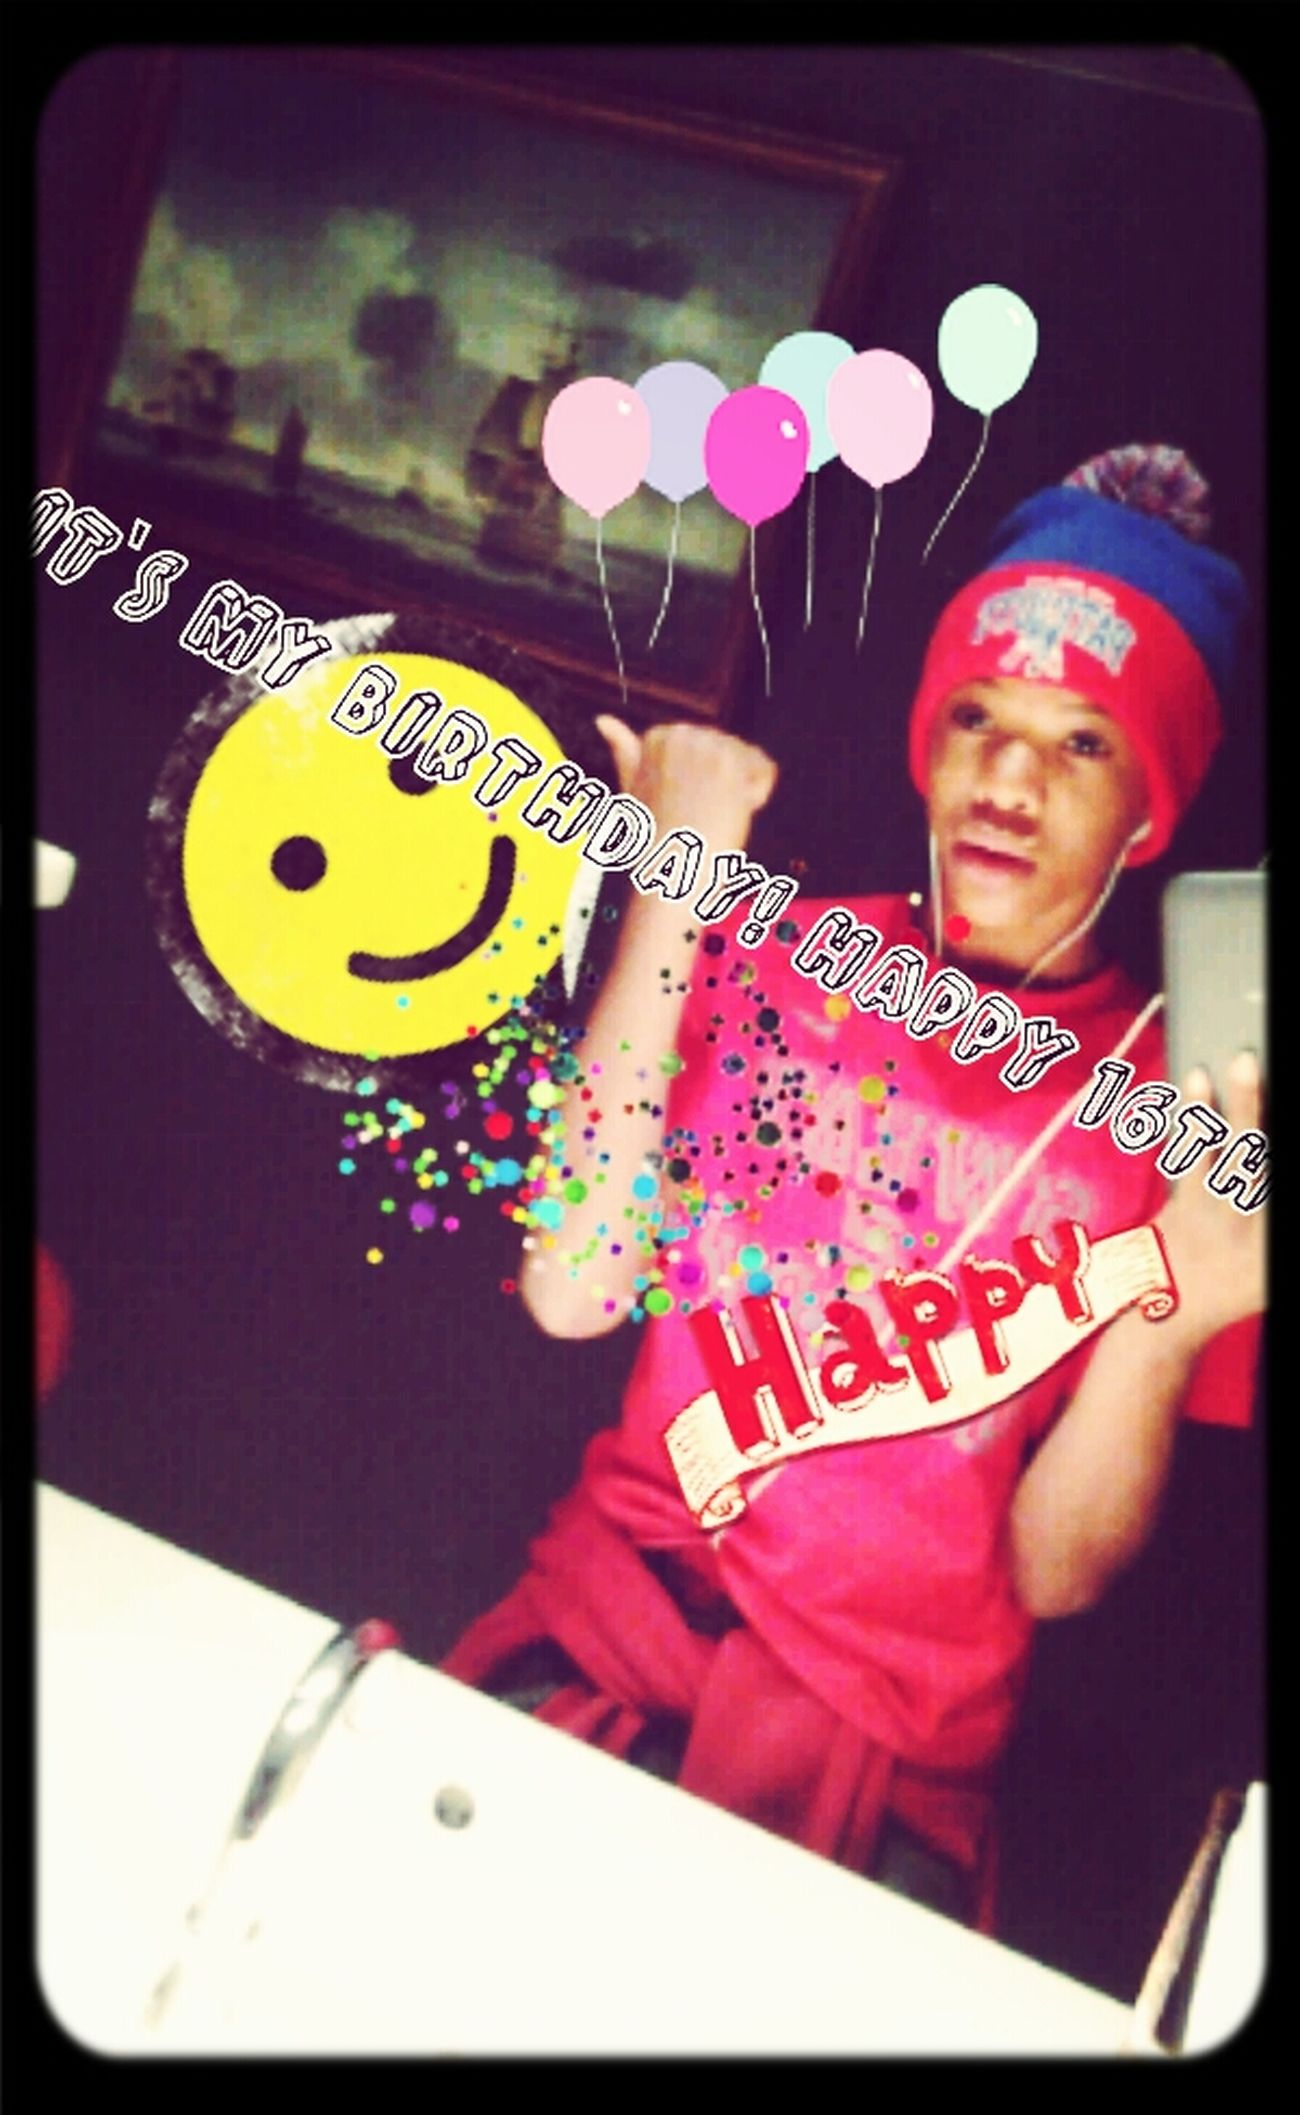 it's my birthday! happy 16th